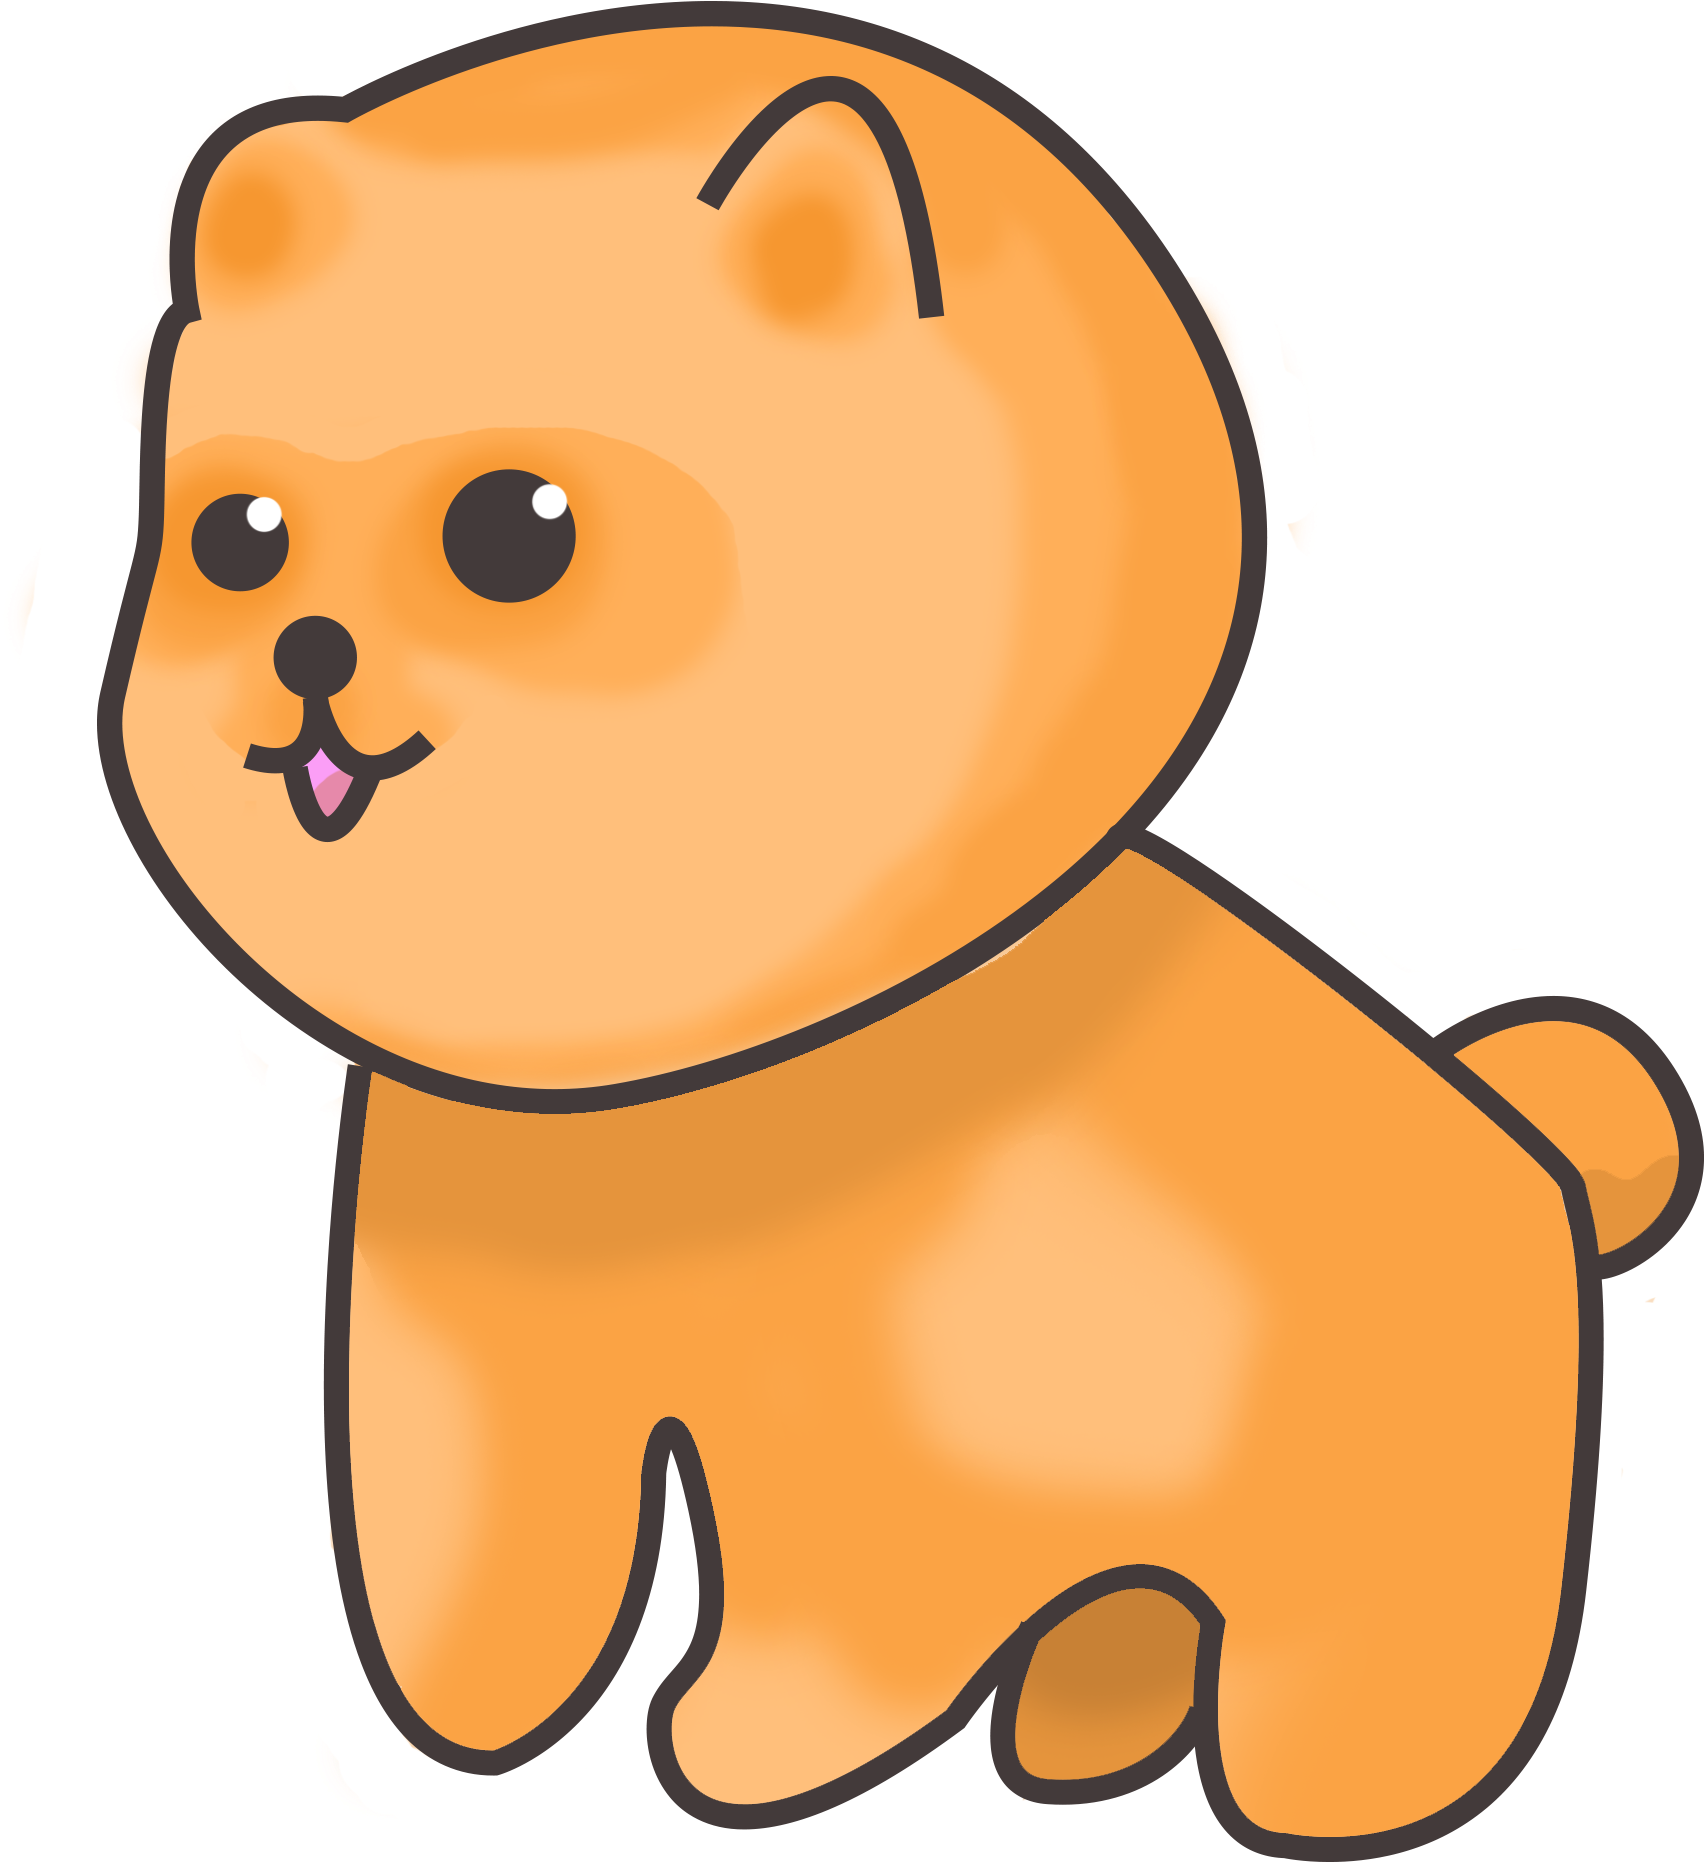 Jpg Royalty Free Stock Lucky Sketch Pomeranian Chibi Full Size Png Download Seekpng